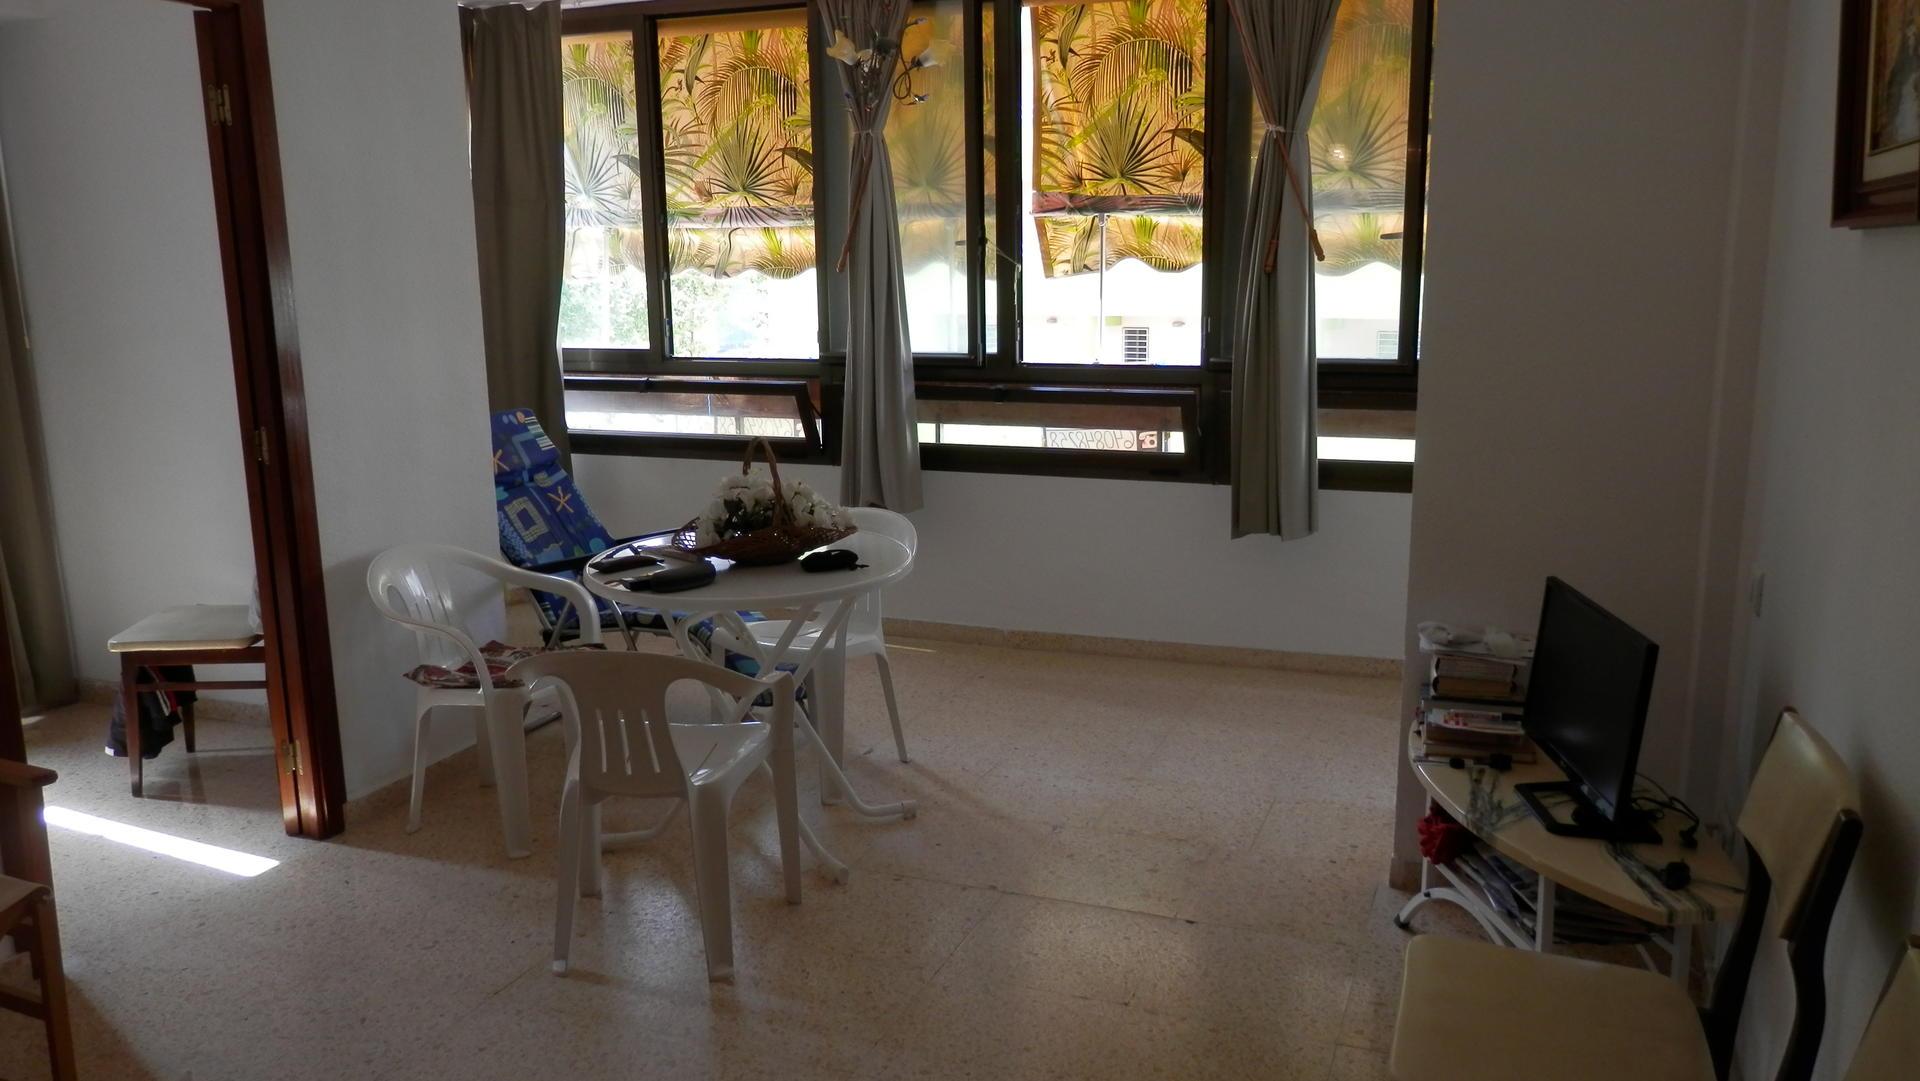 Apartamento -                                       Benidorm -                                       2 dormitorios -                                       0 ocupantes